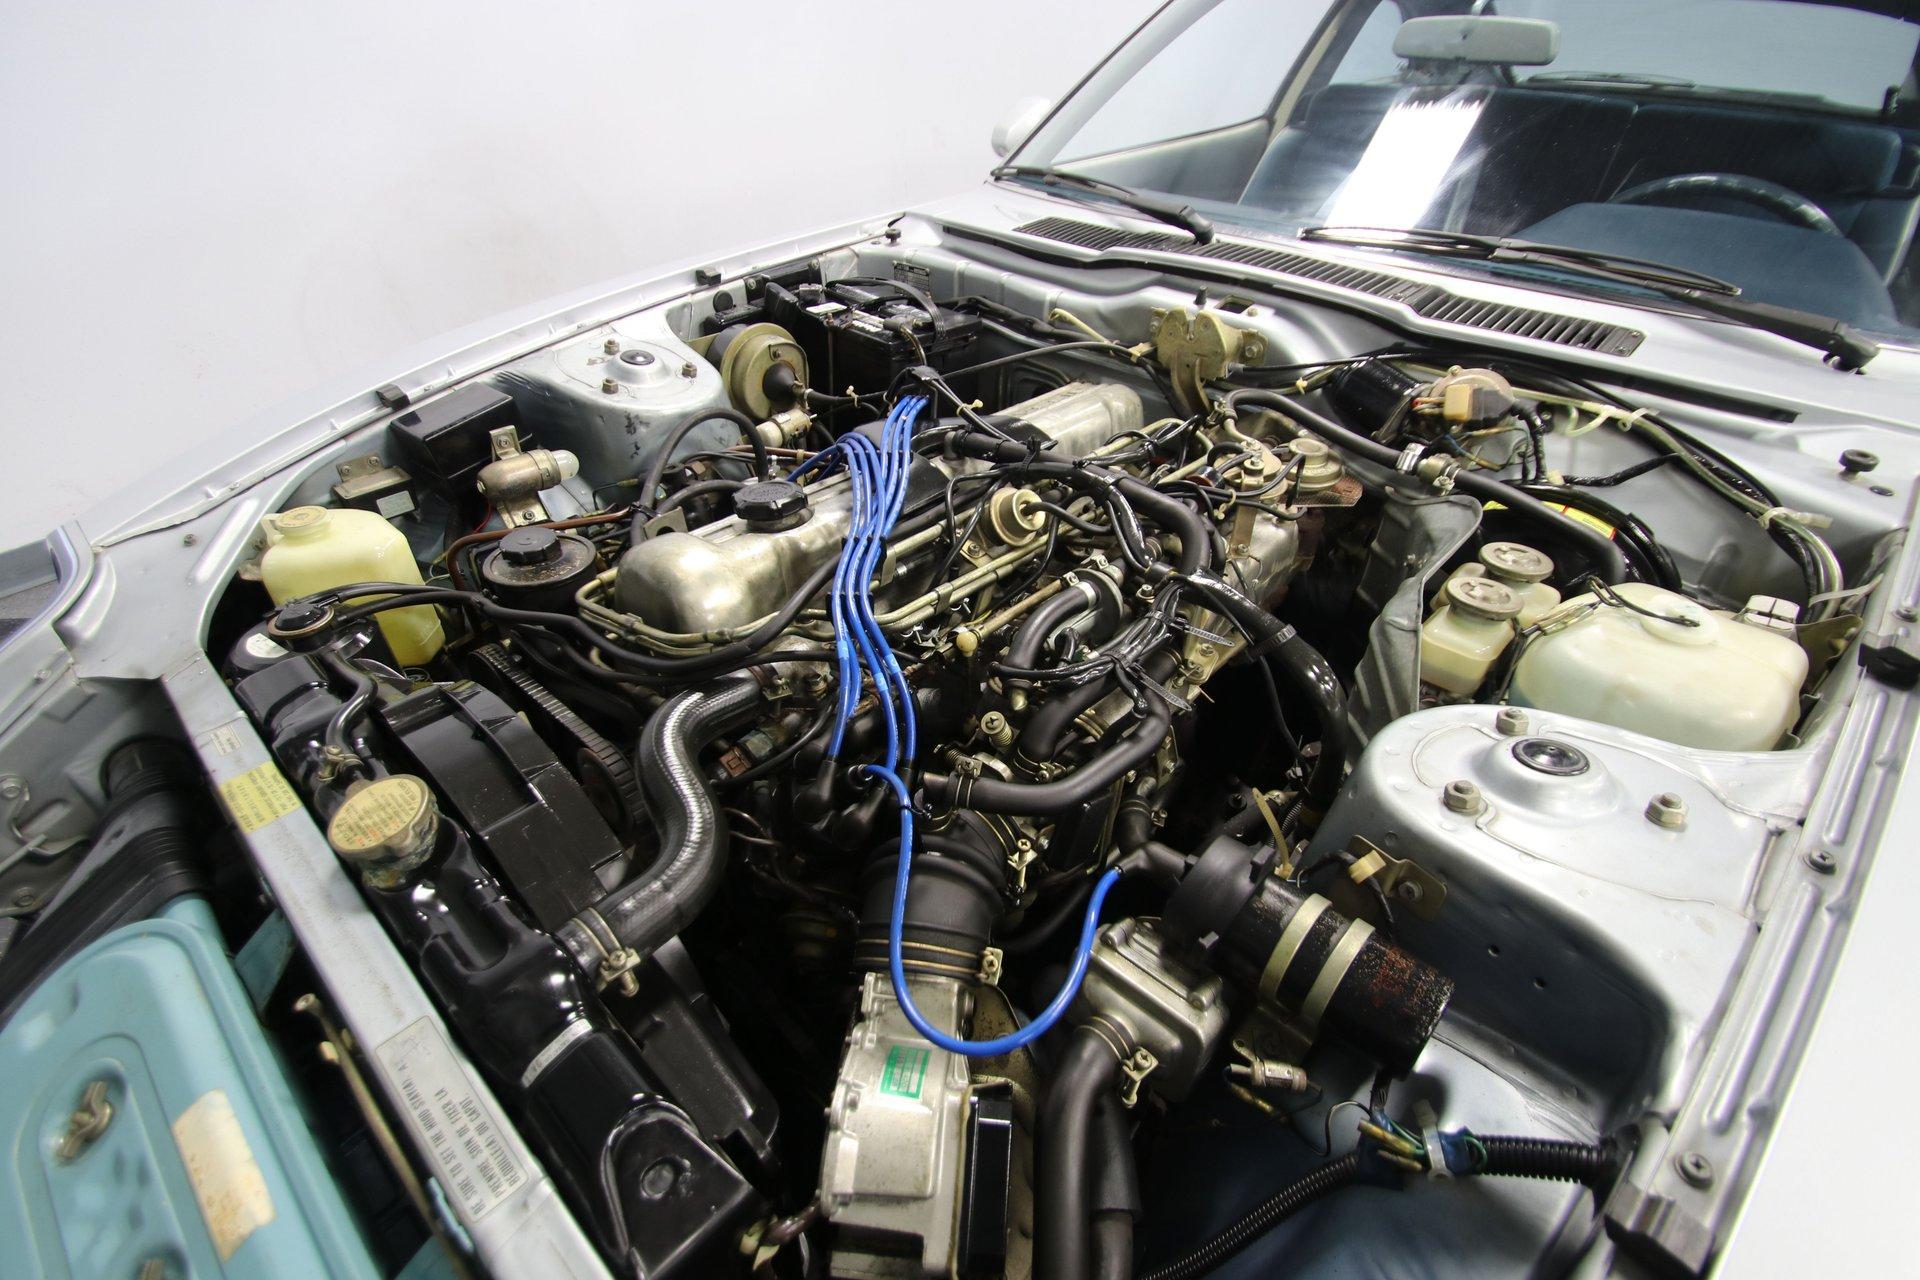 1980 datsun 280zx 2 2